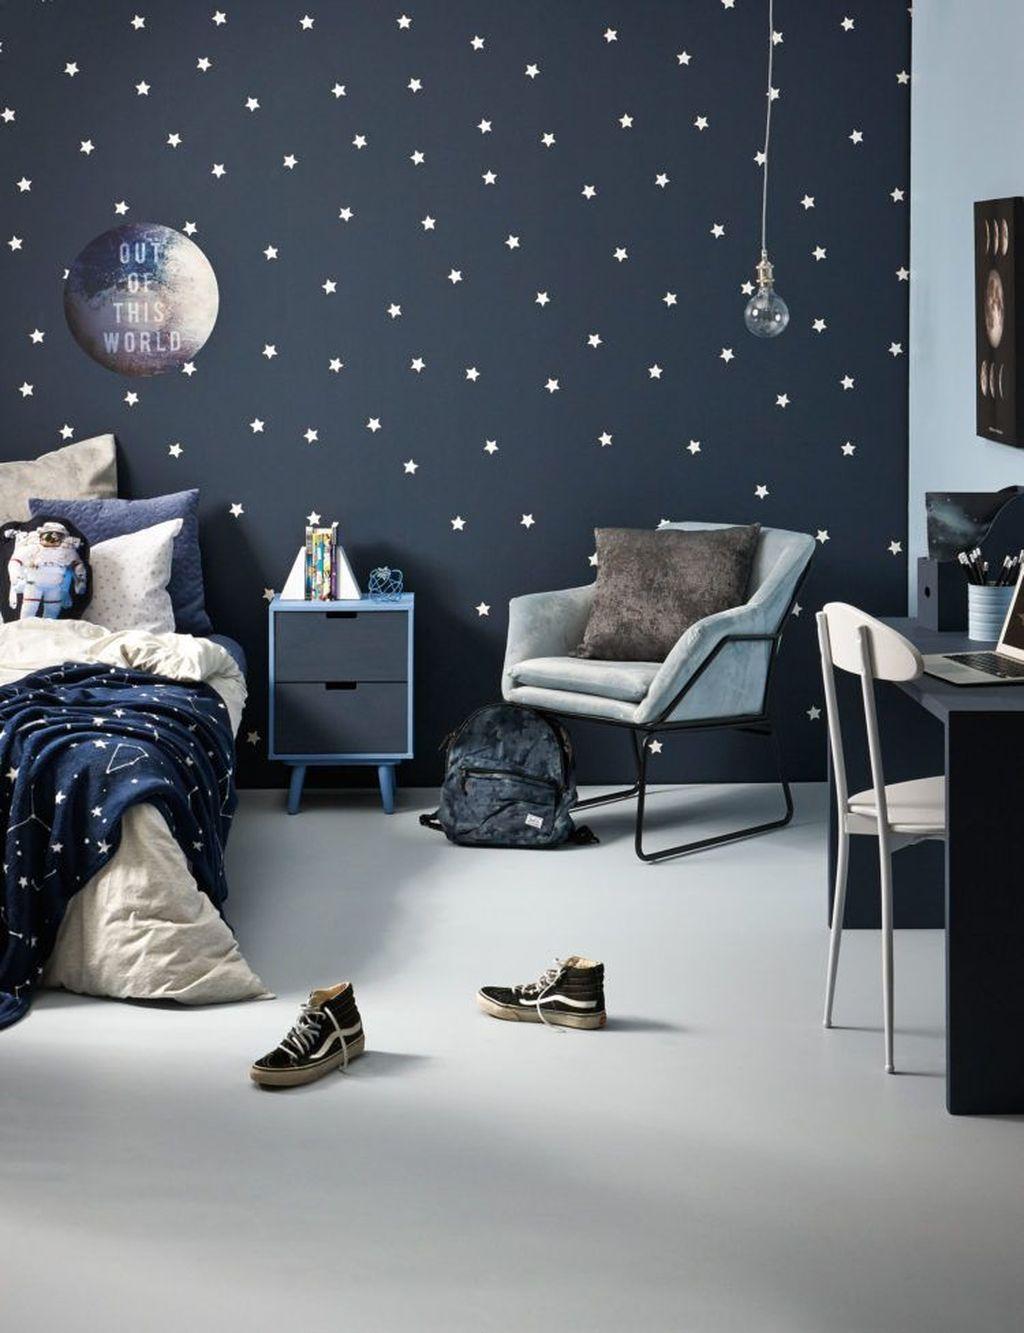 Inspiring Outer Space Bedroom Decor Ideas 11